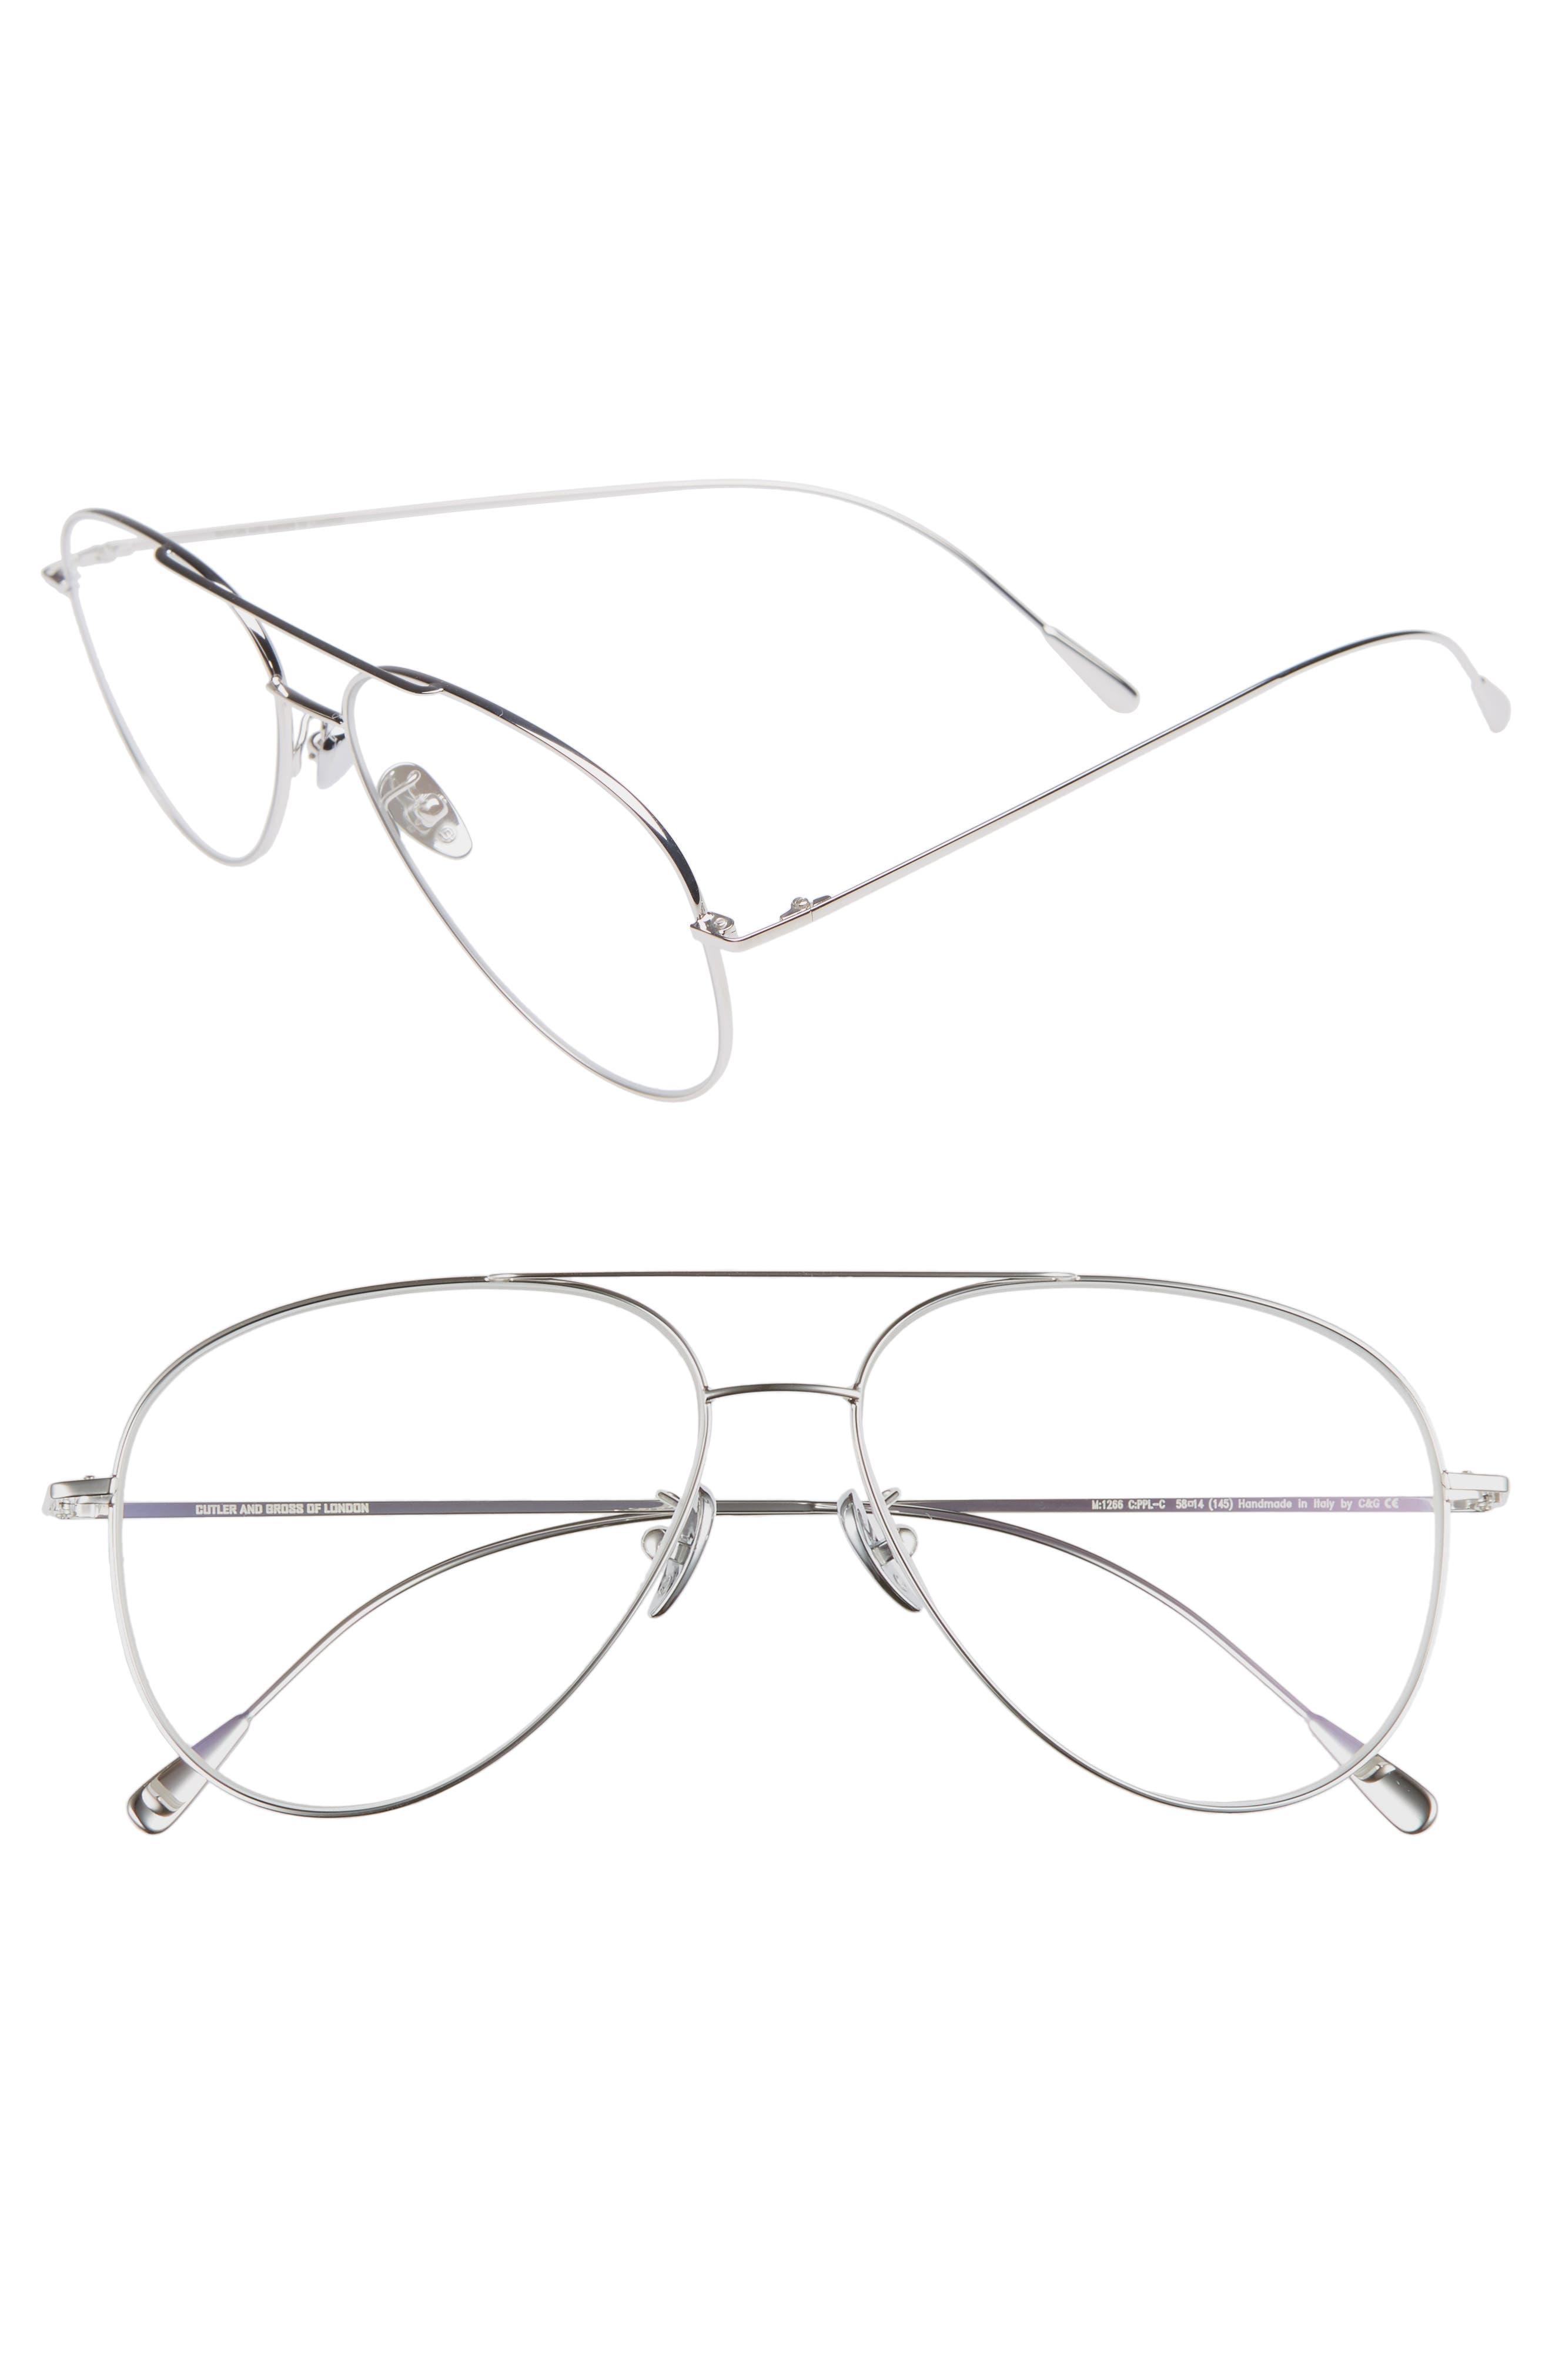 58mm Polarized Aviator Optical Glasses,                         Main,                         color, PALLADIUM